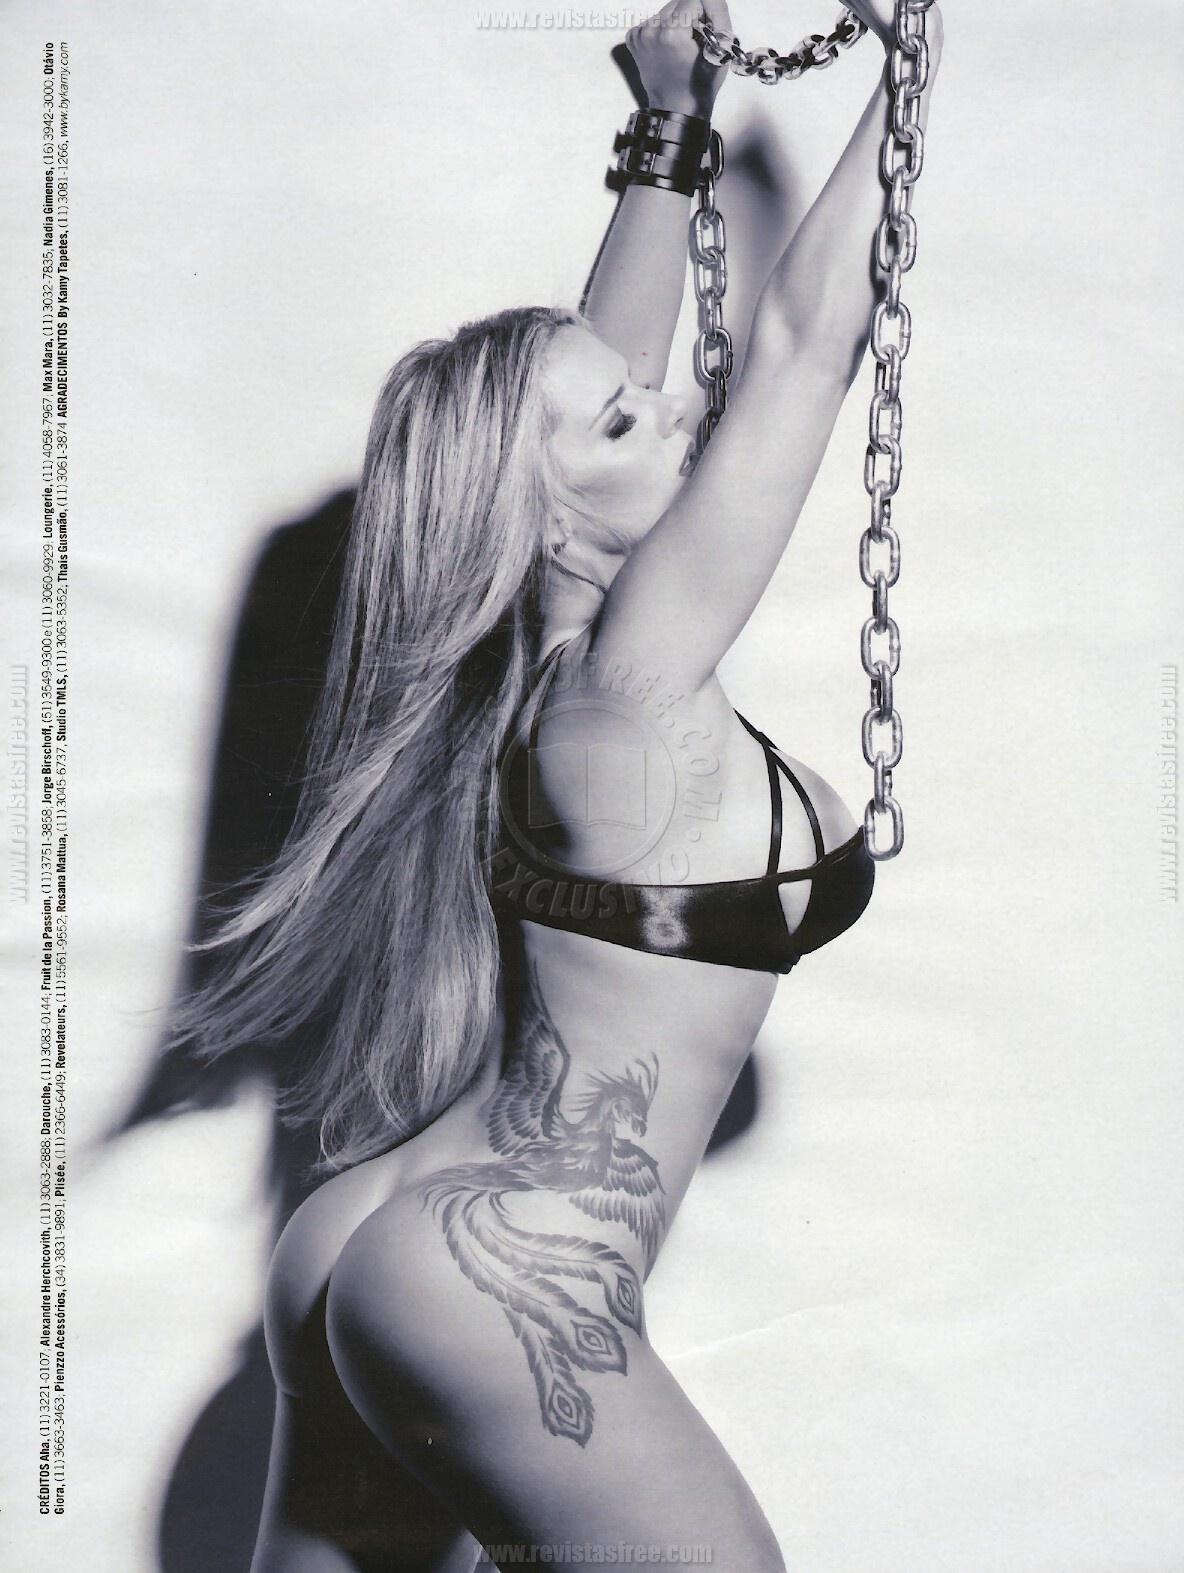 Revista Playboy Capa Denise Rocha Setembro Editora Abril